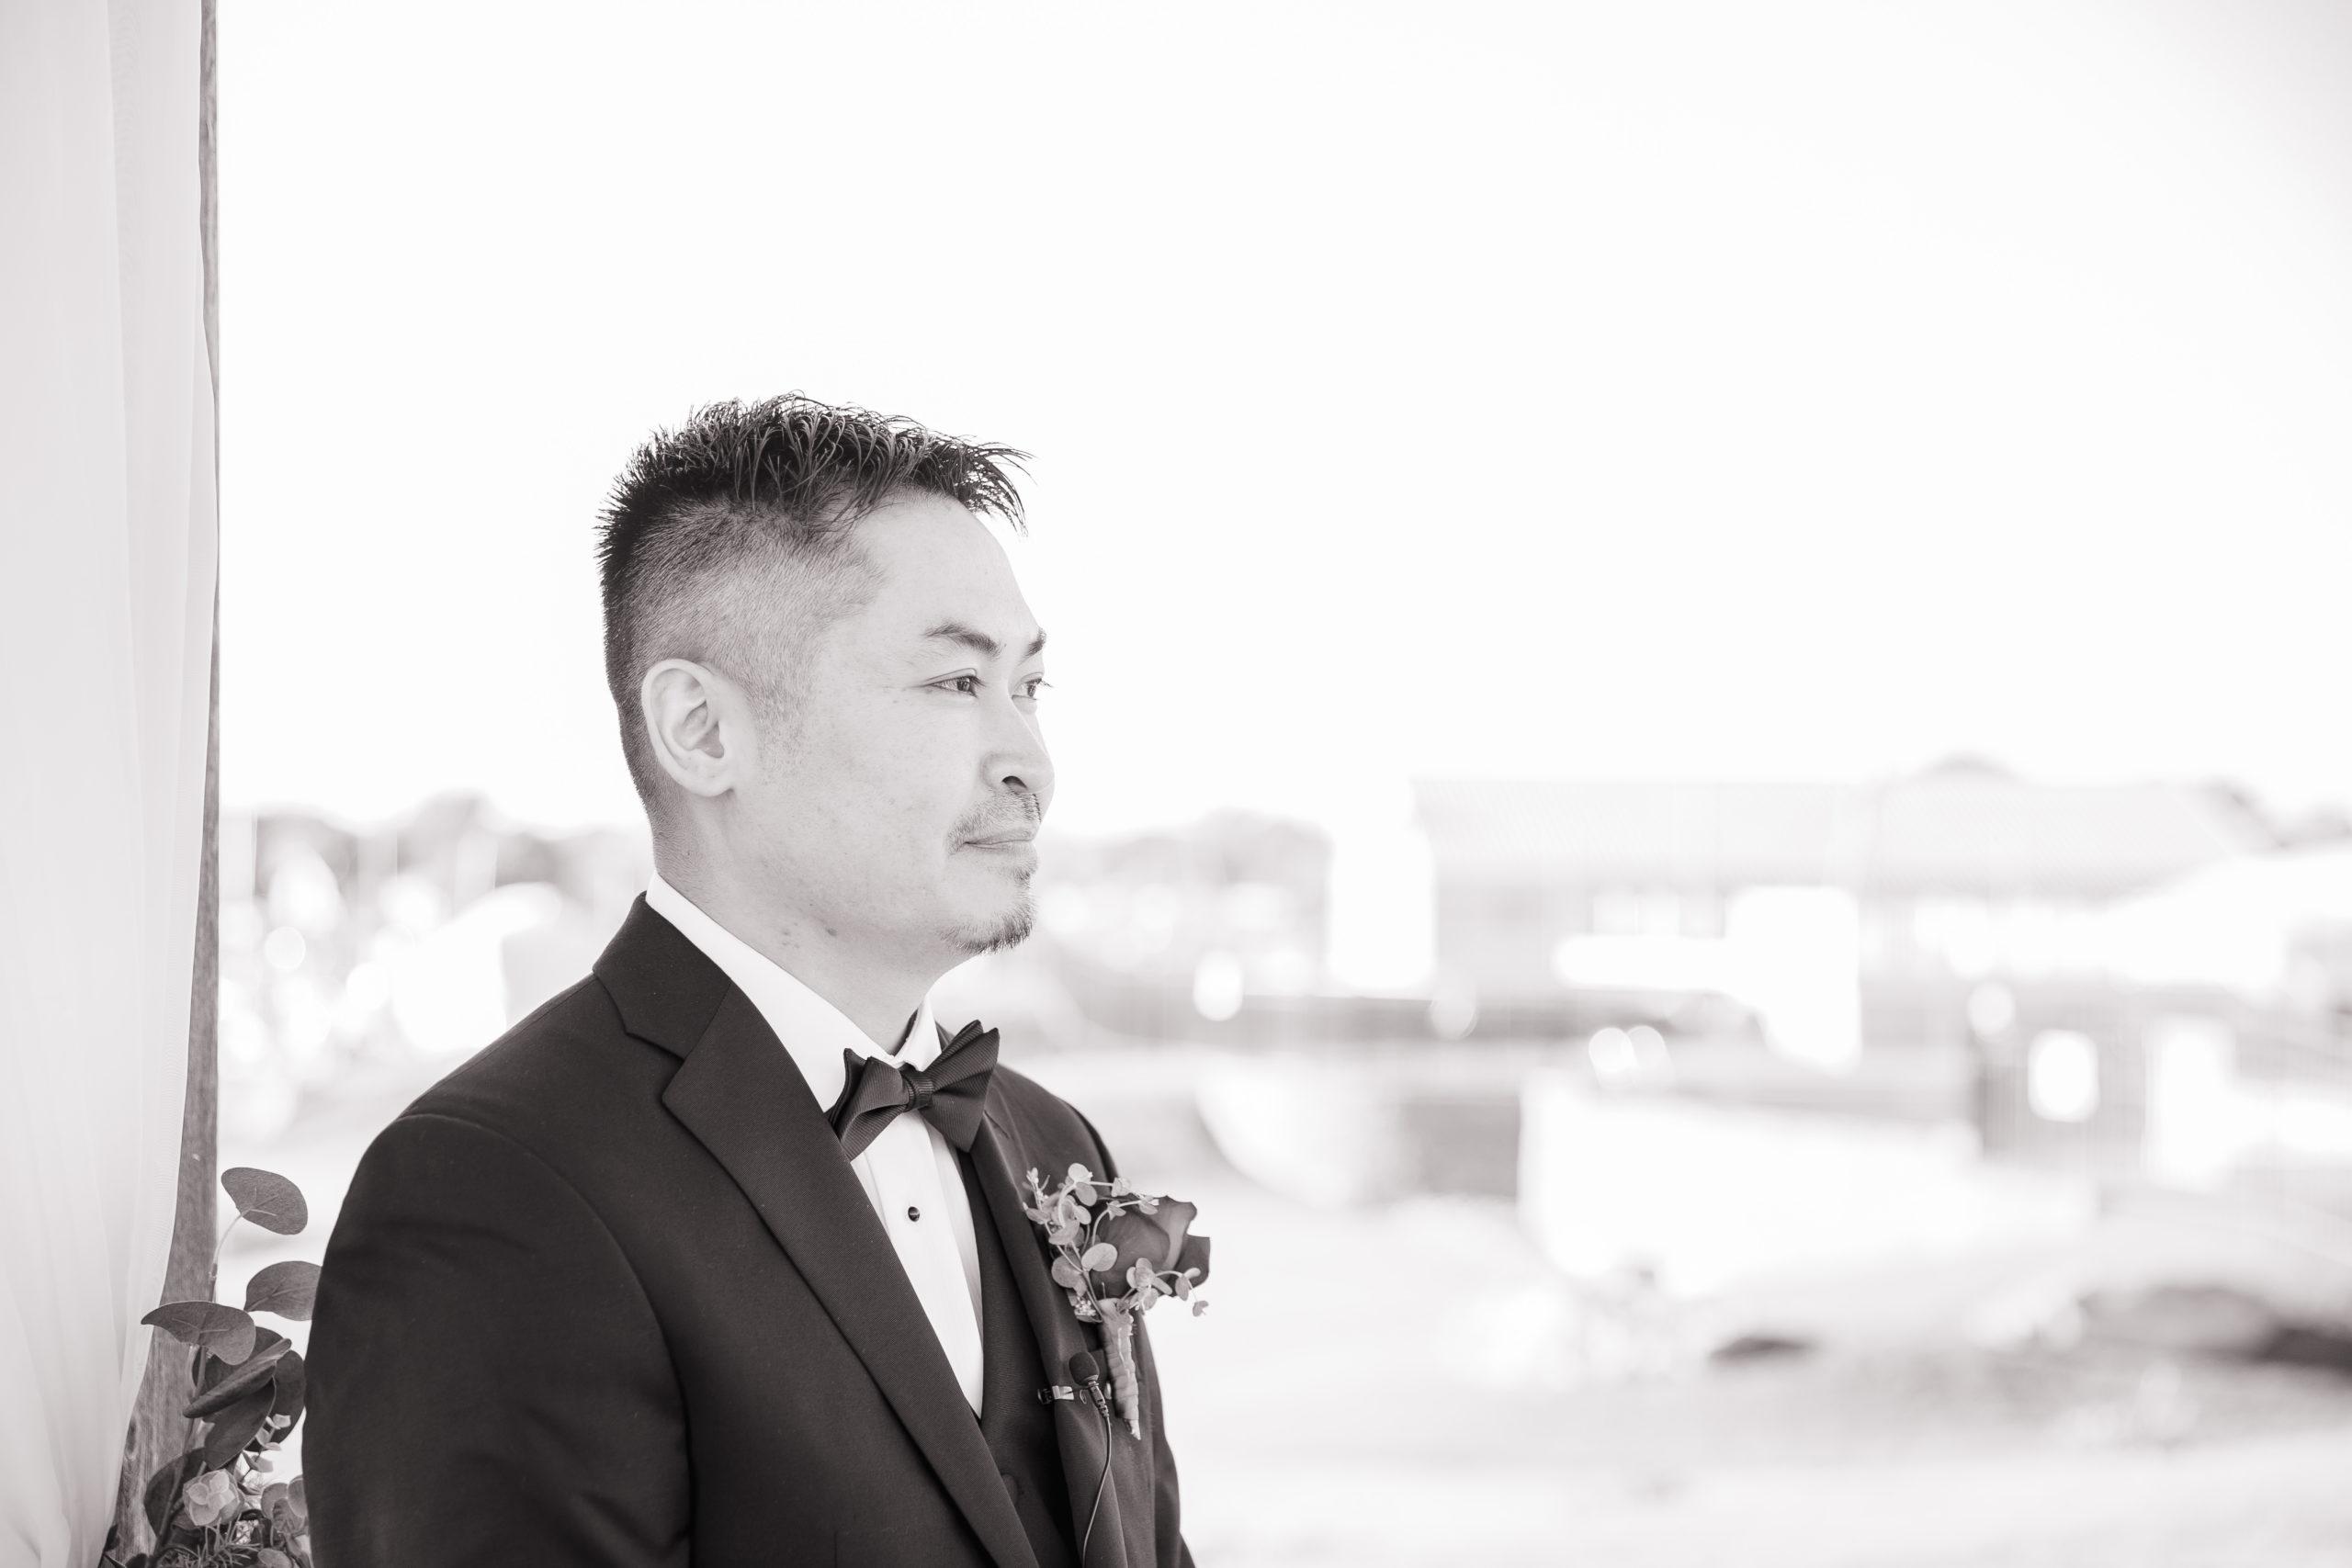 Harbor lights, warwick, rhode island, RI, Tracy Jenkins Photography, RI wedding photographer, Rhode Island wedding photographer, micro-wedding, Groom, coming down the aisle